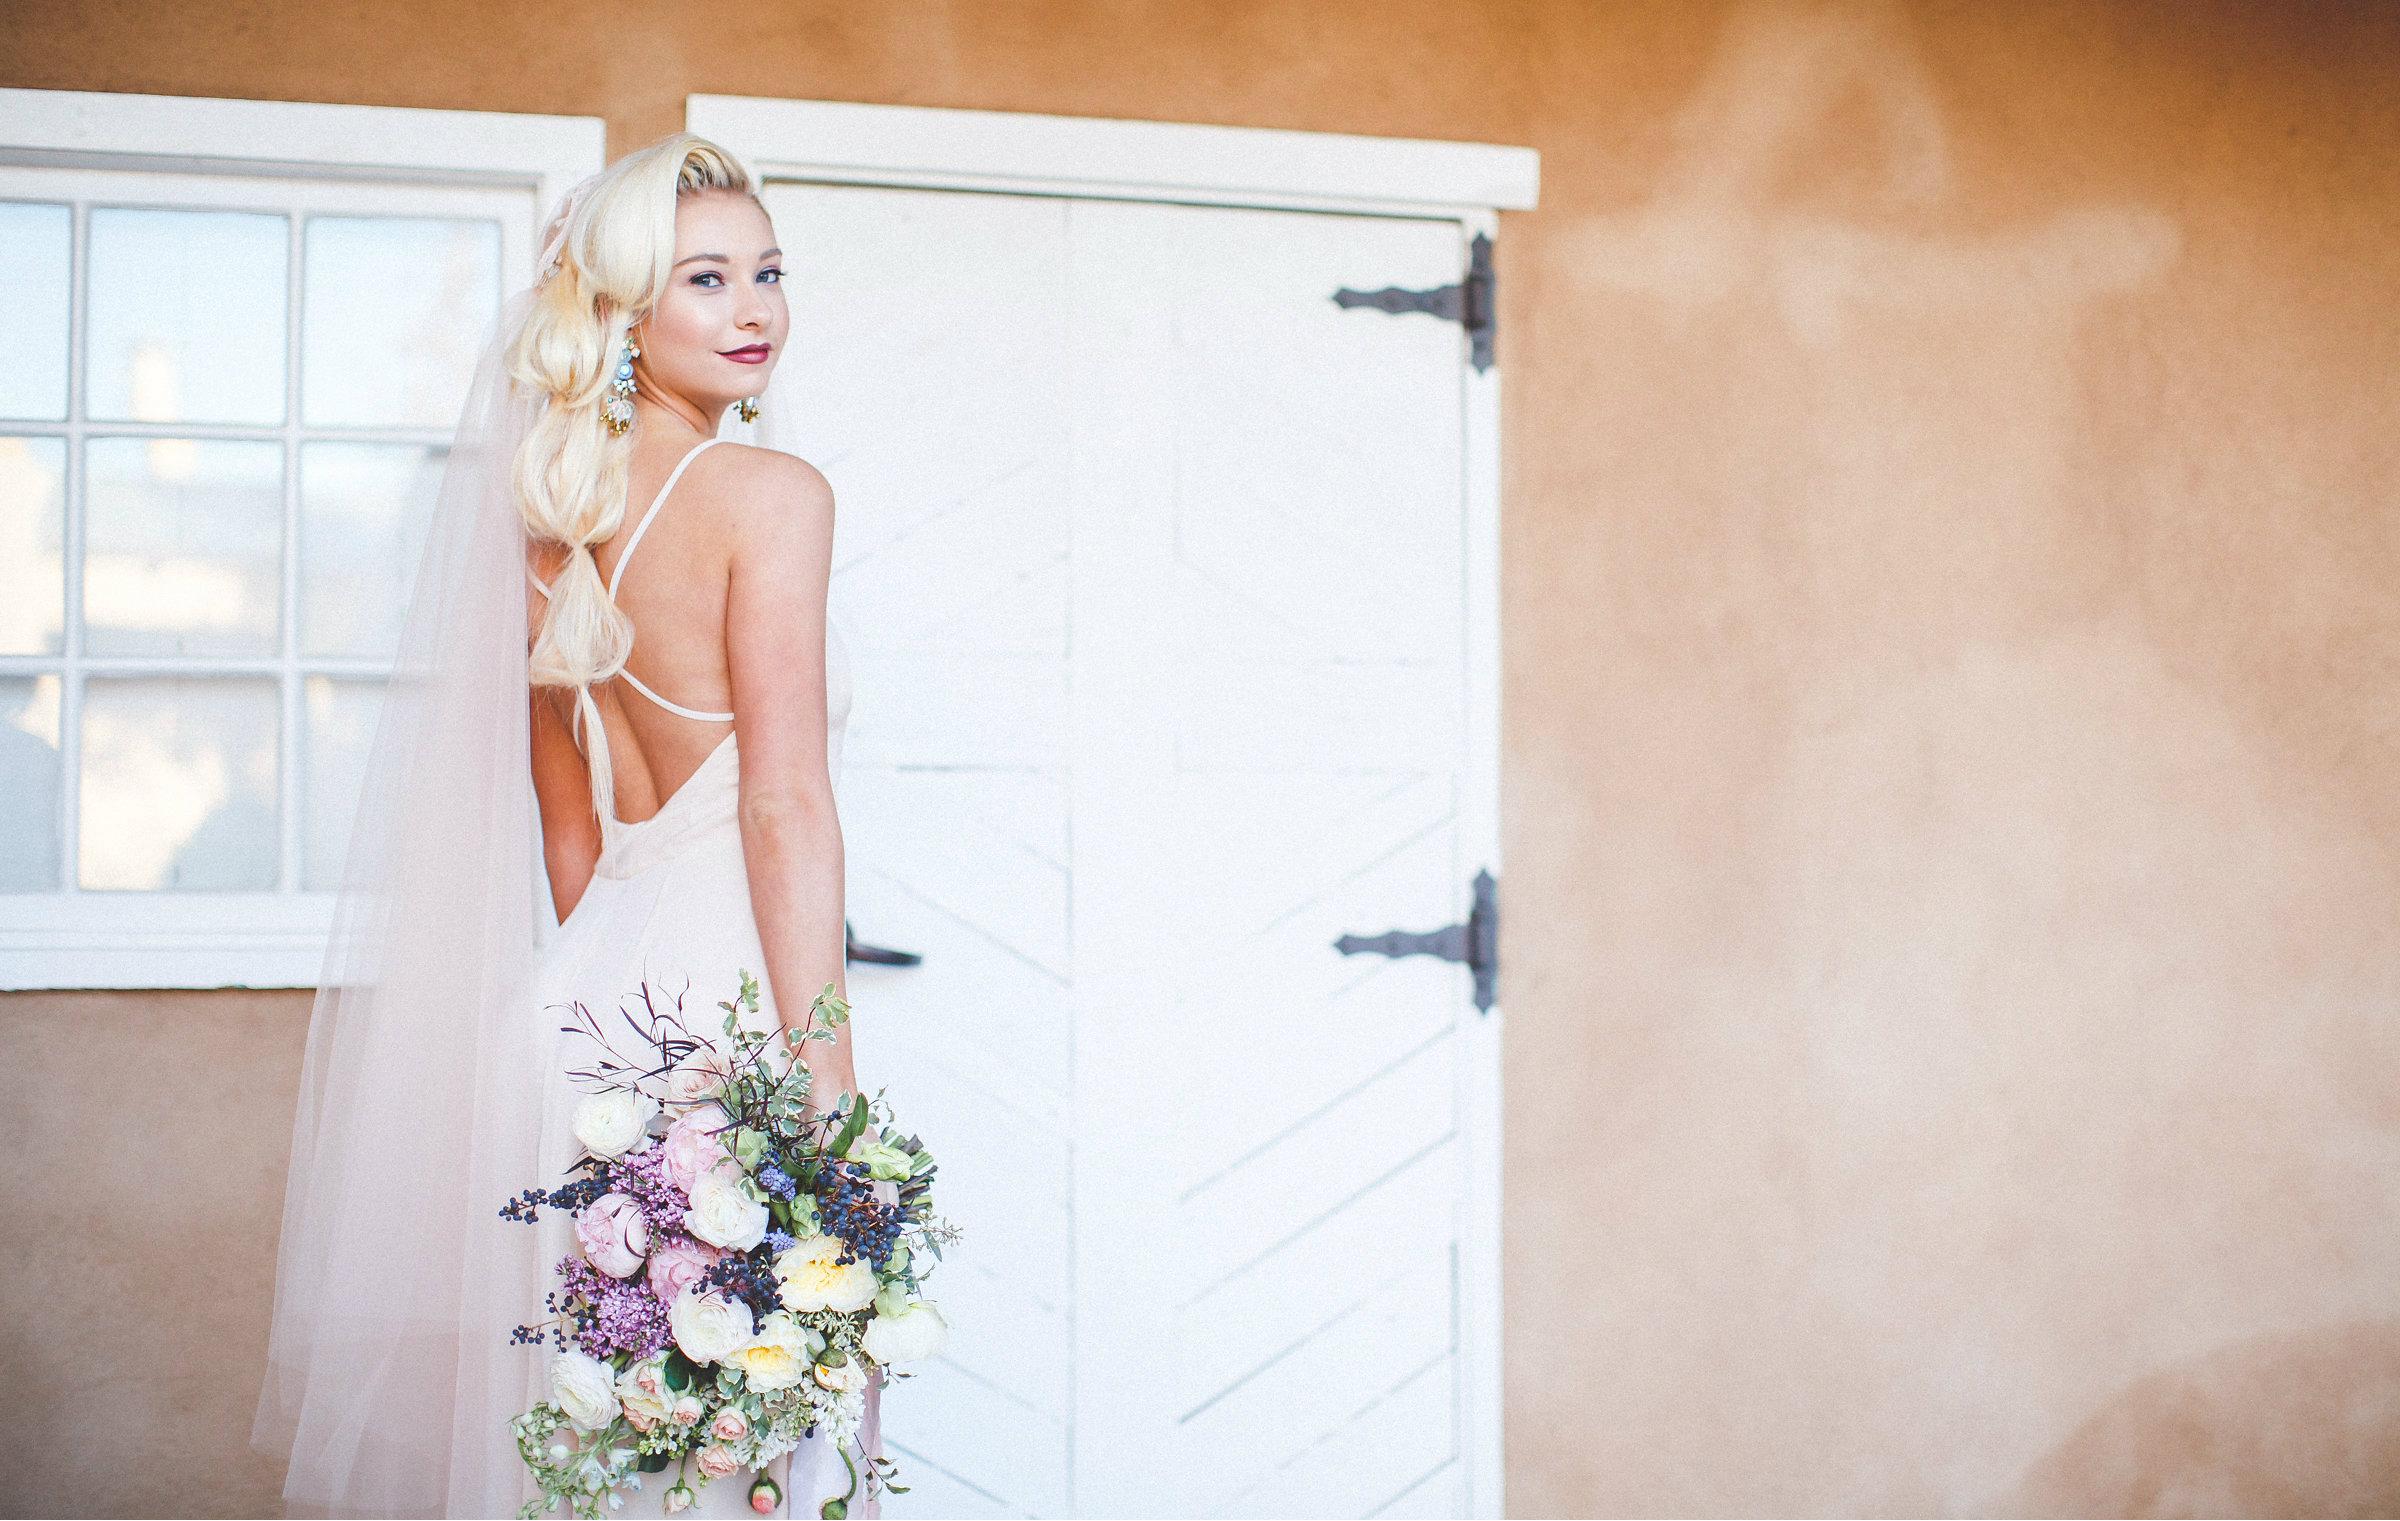 Santa+fe+wedding+florist+Renegade+Floral.jpg